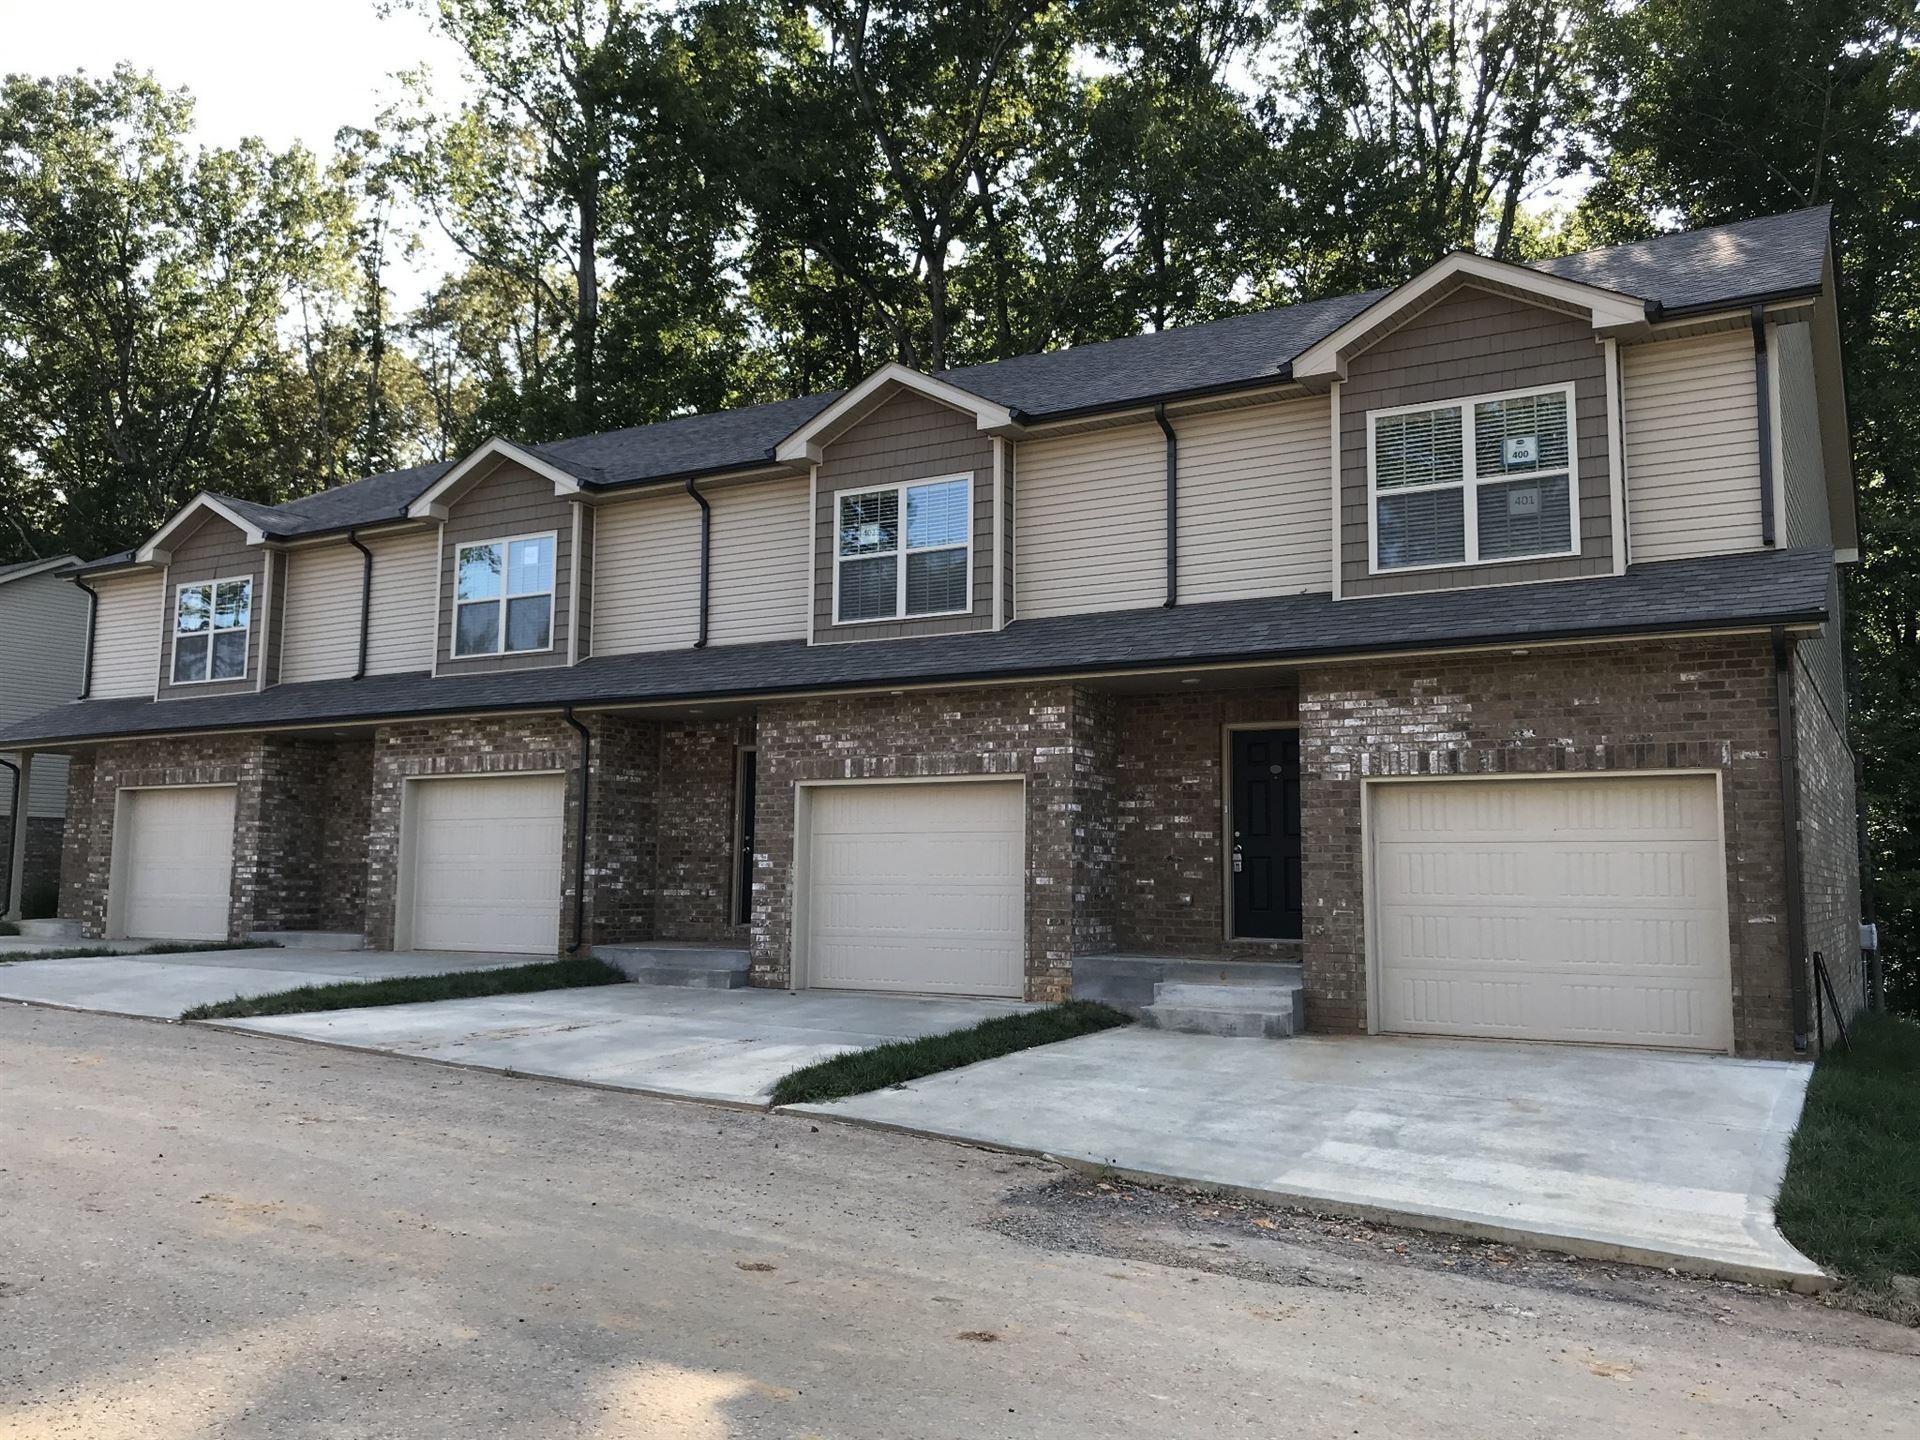 135 Country Lane Unit 402, Clarksville, TN 37043 - MLS#: 2177032